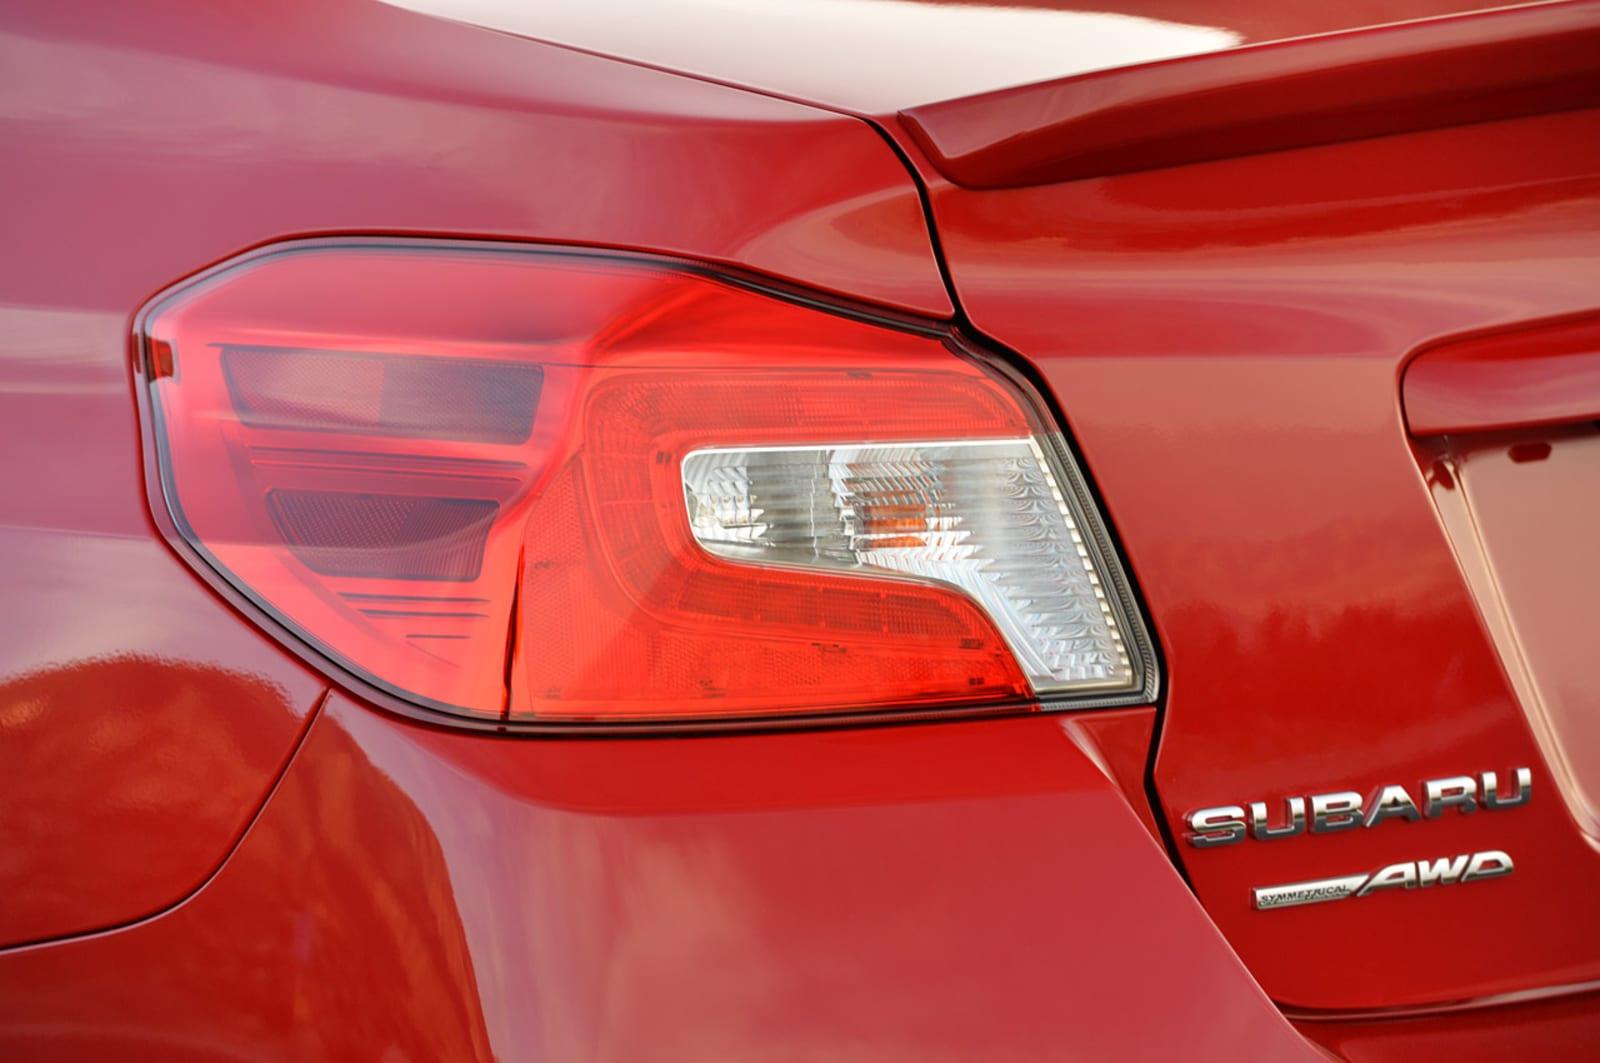 Subaru secures permit to test self-driving car in California